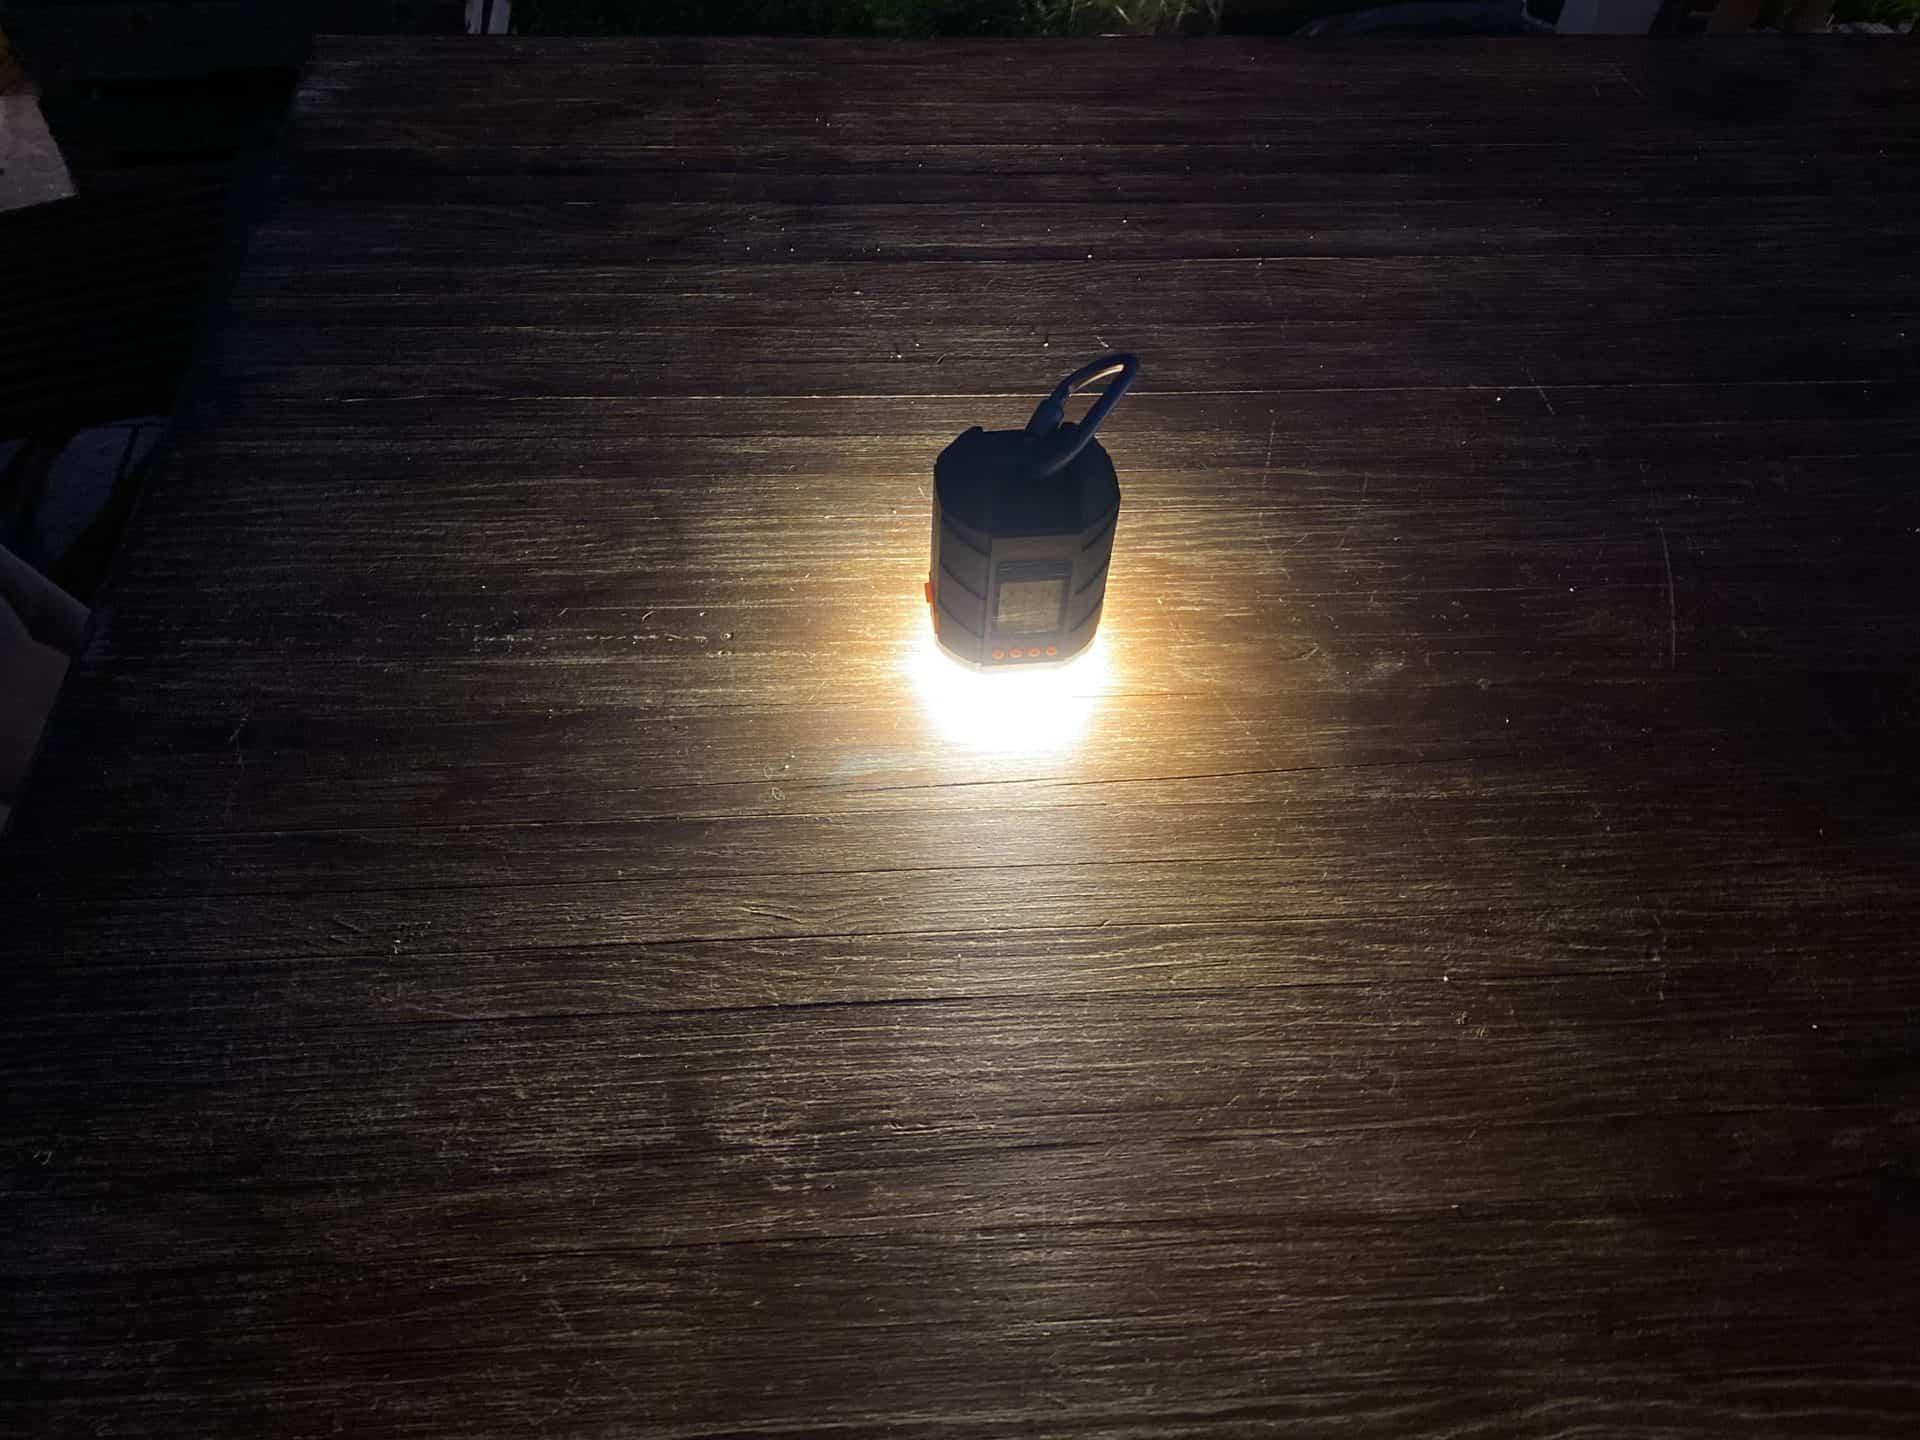 Camping_LED_Licht_Lanktoo_LED_Camping_Nacht_Tisch_beleuchtet